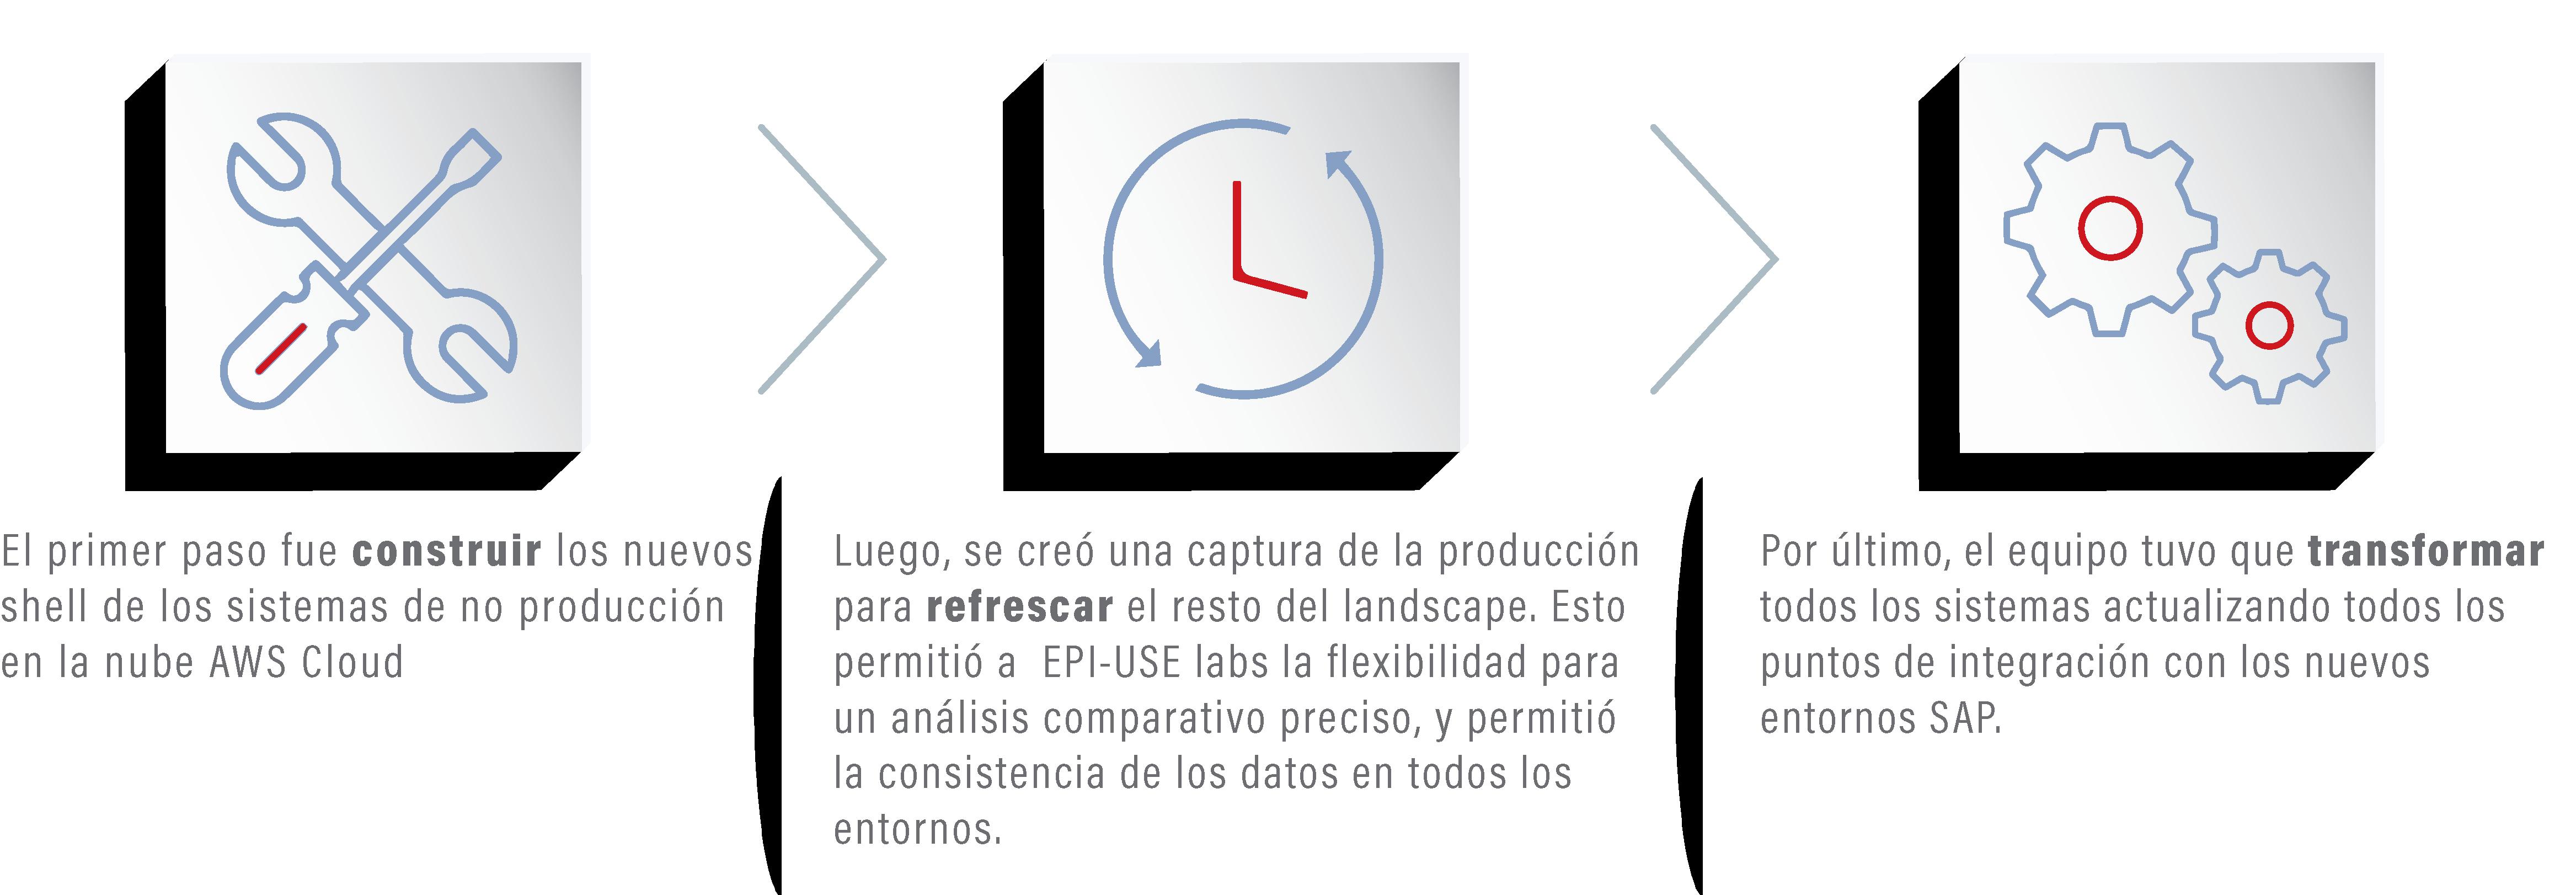 El alcance del proyecto de realineación incluía los sistemas SAP ECC (Enterprise Central Component), SAP EWM (Extended Warehouse Management), SAP PI (Process Integration) y SAP BW (Business Warehouse).